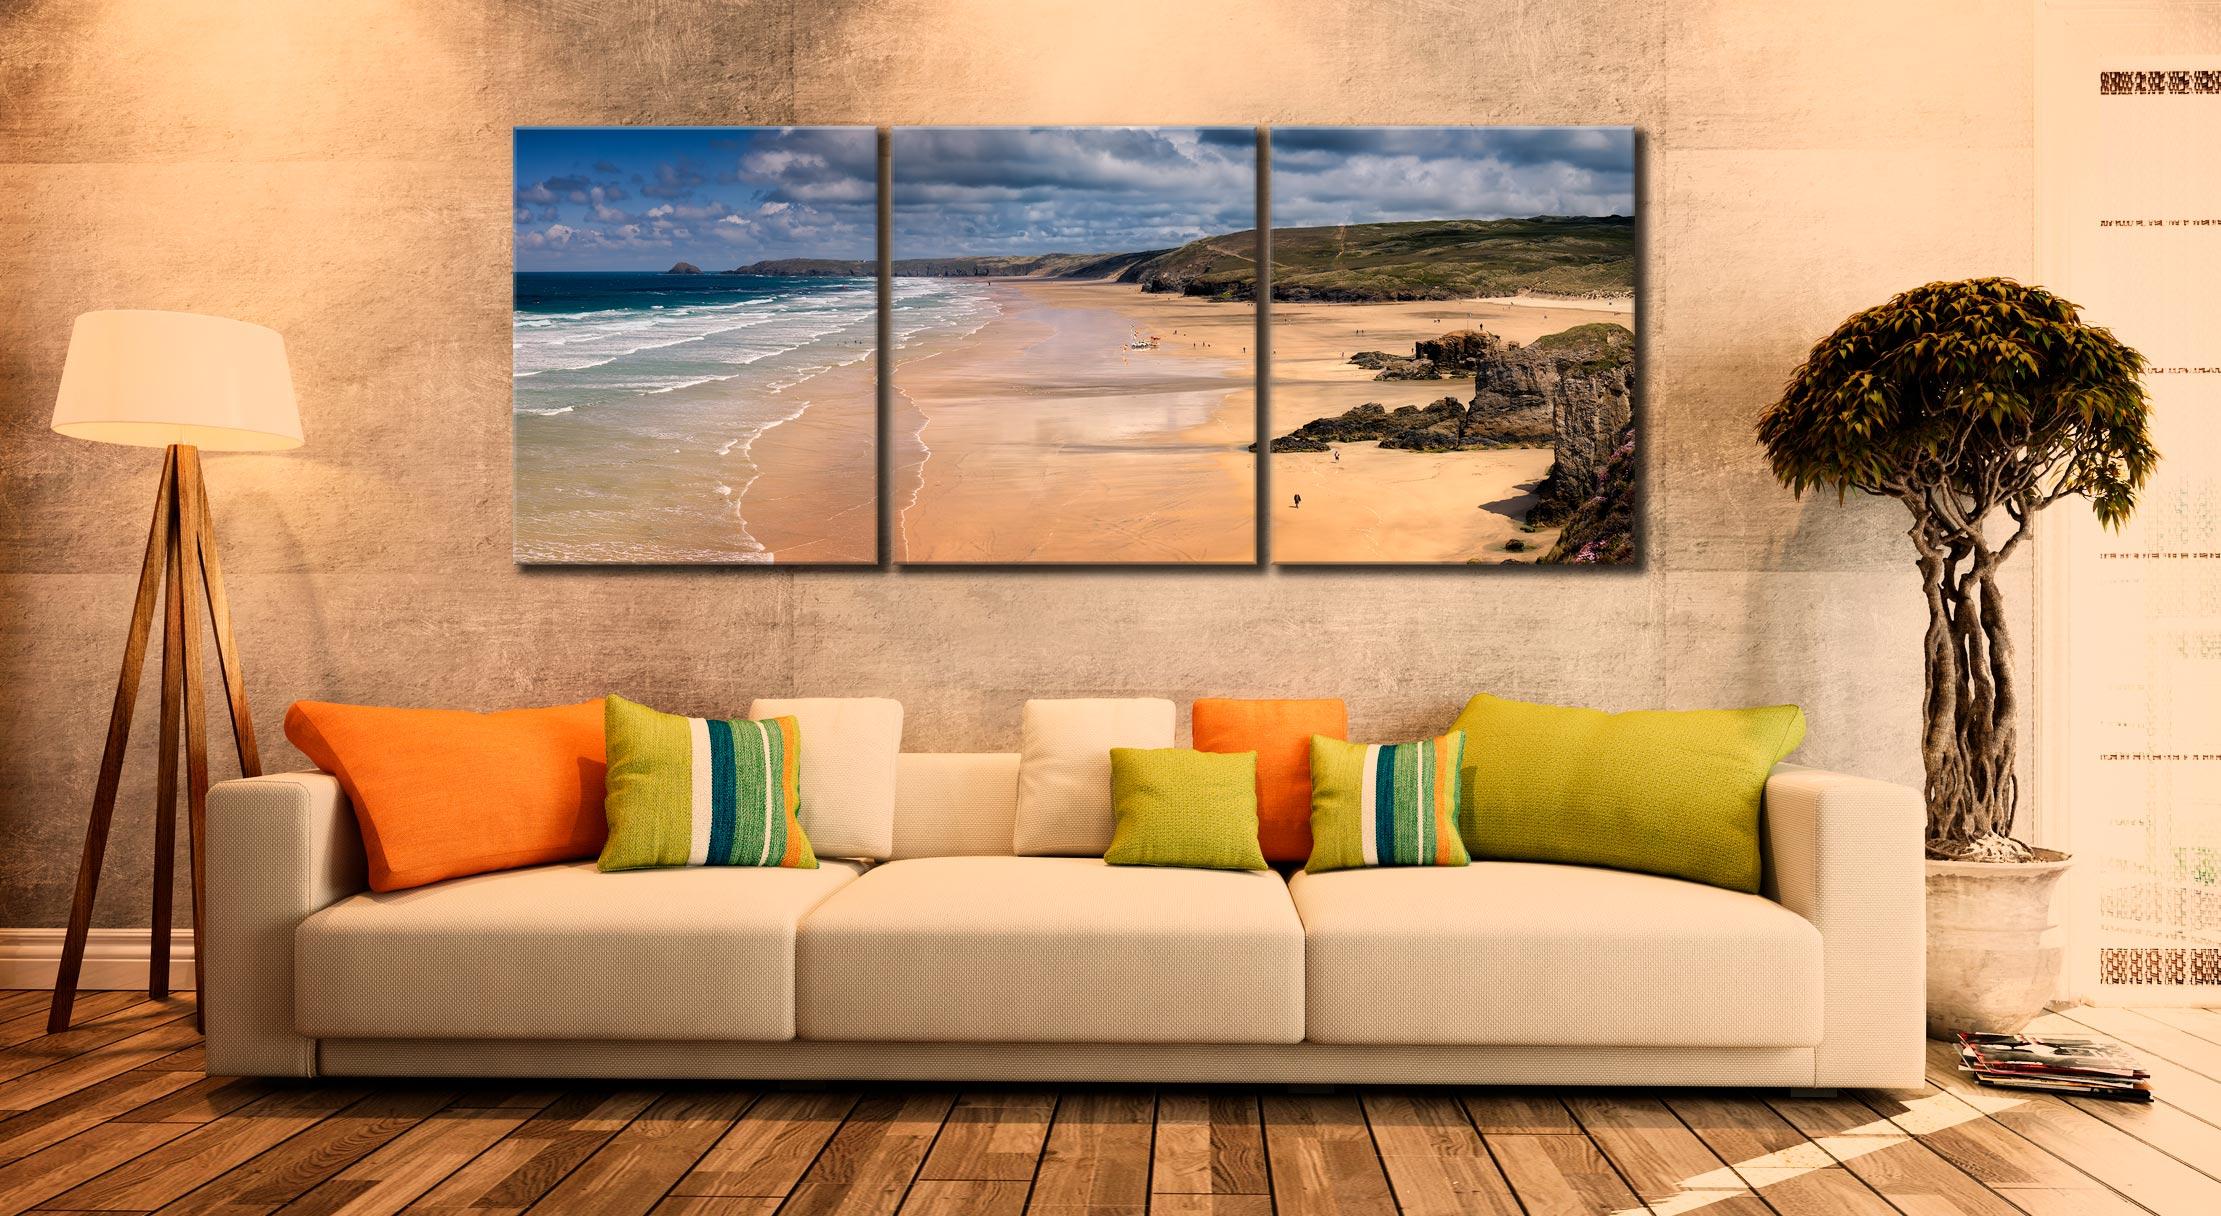 Perranporth Beach - 3 Panel Canvas on Wall